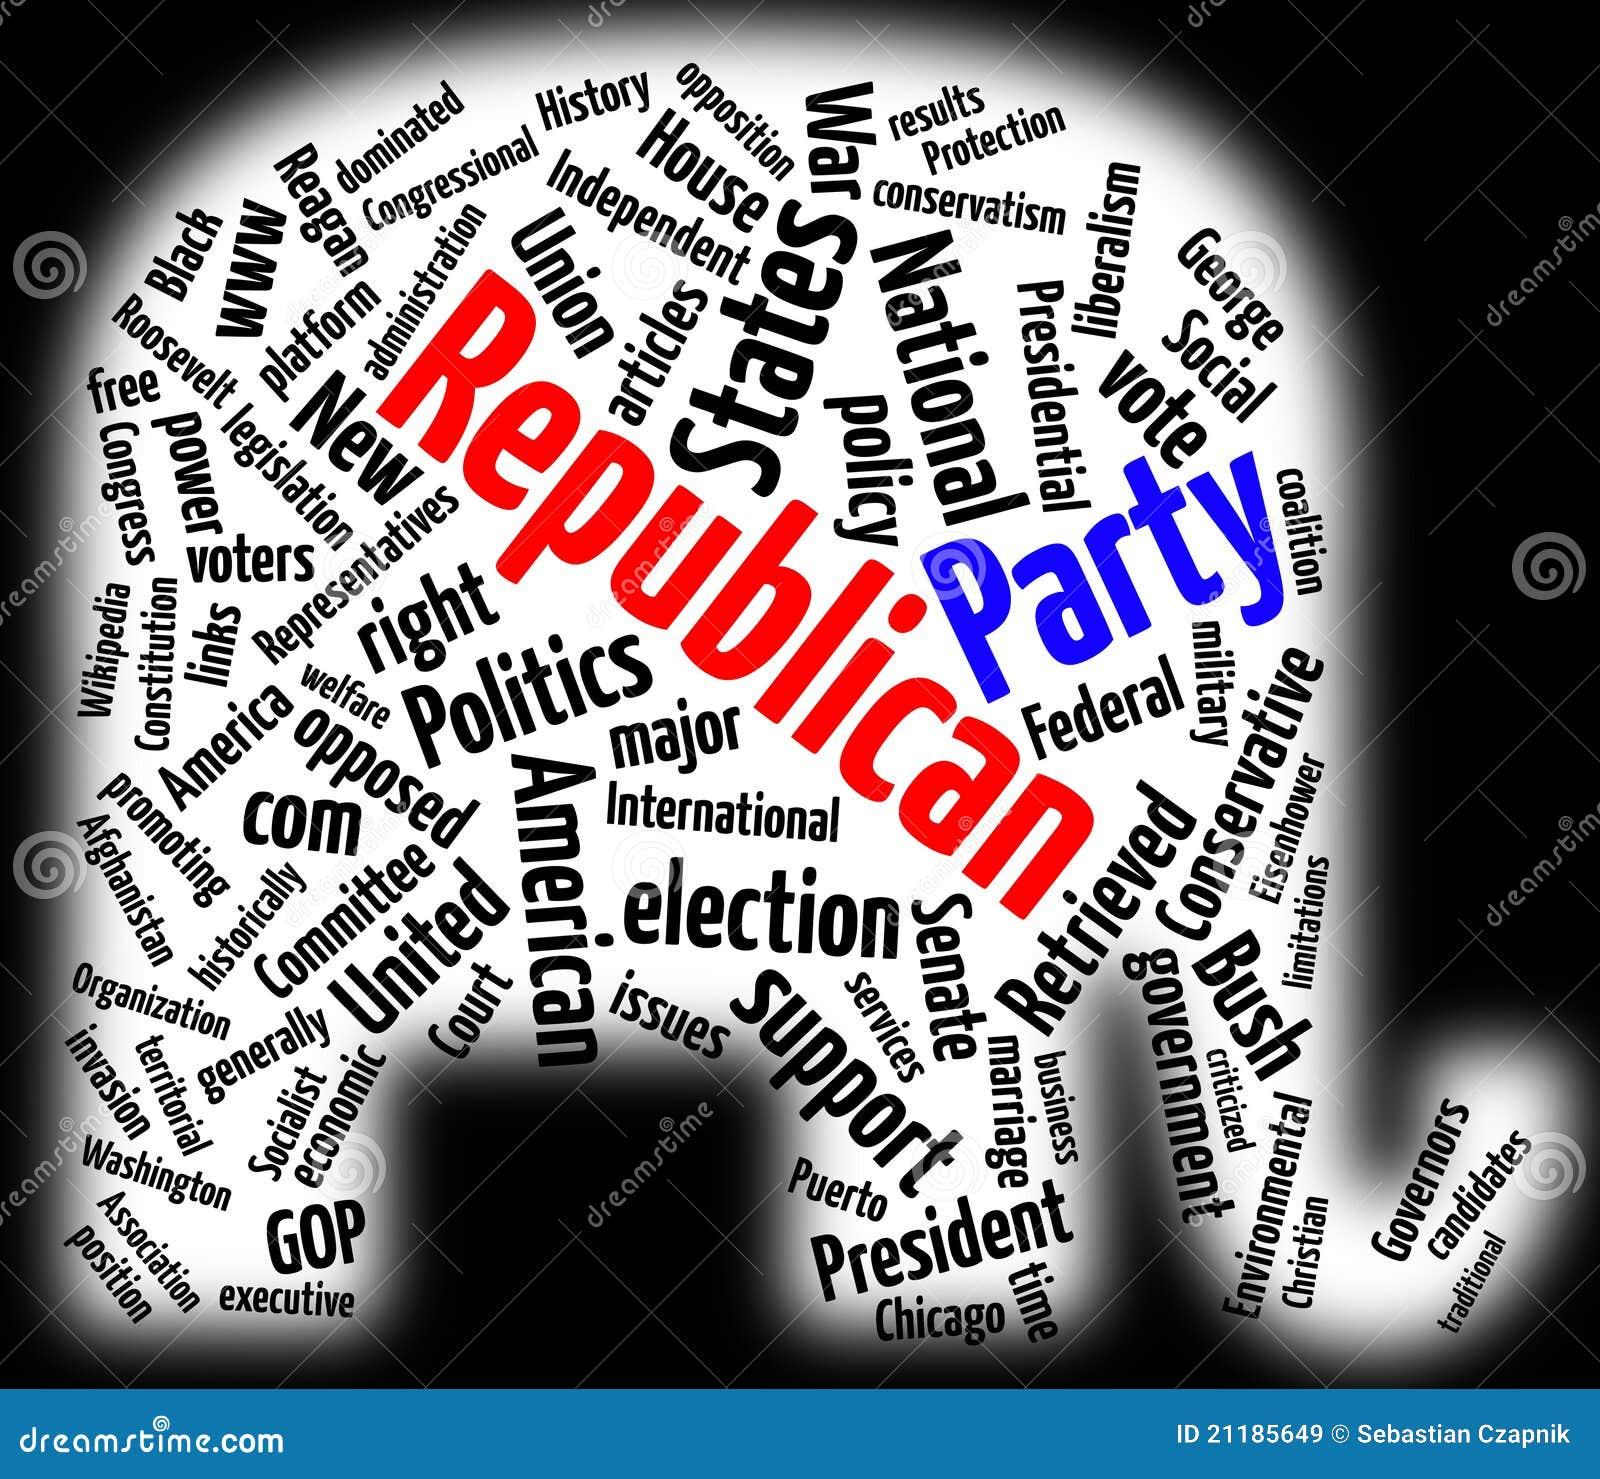 Republican Party word cloud